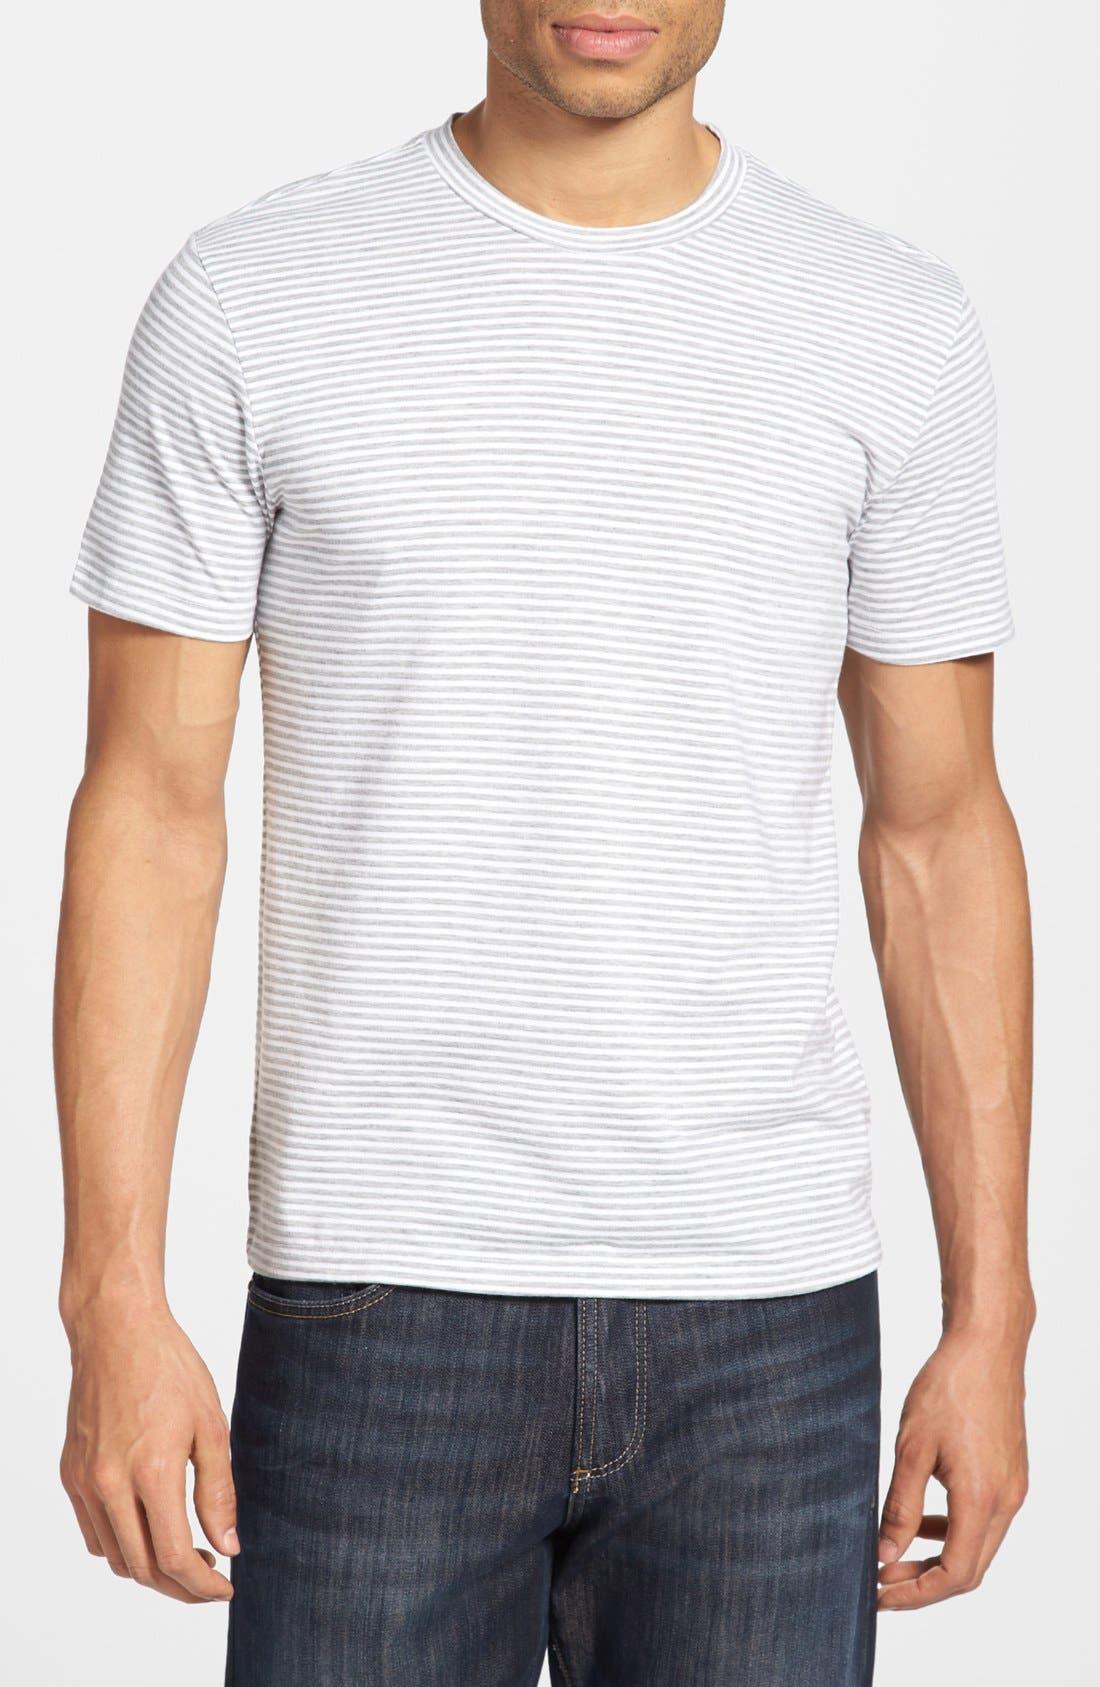 Alternate Image 1 Selected - The Rail Feeder Stripe Crewneck T-Shirt